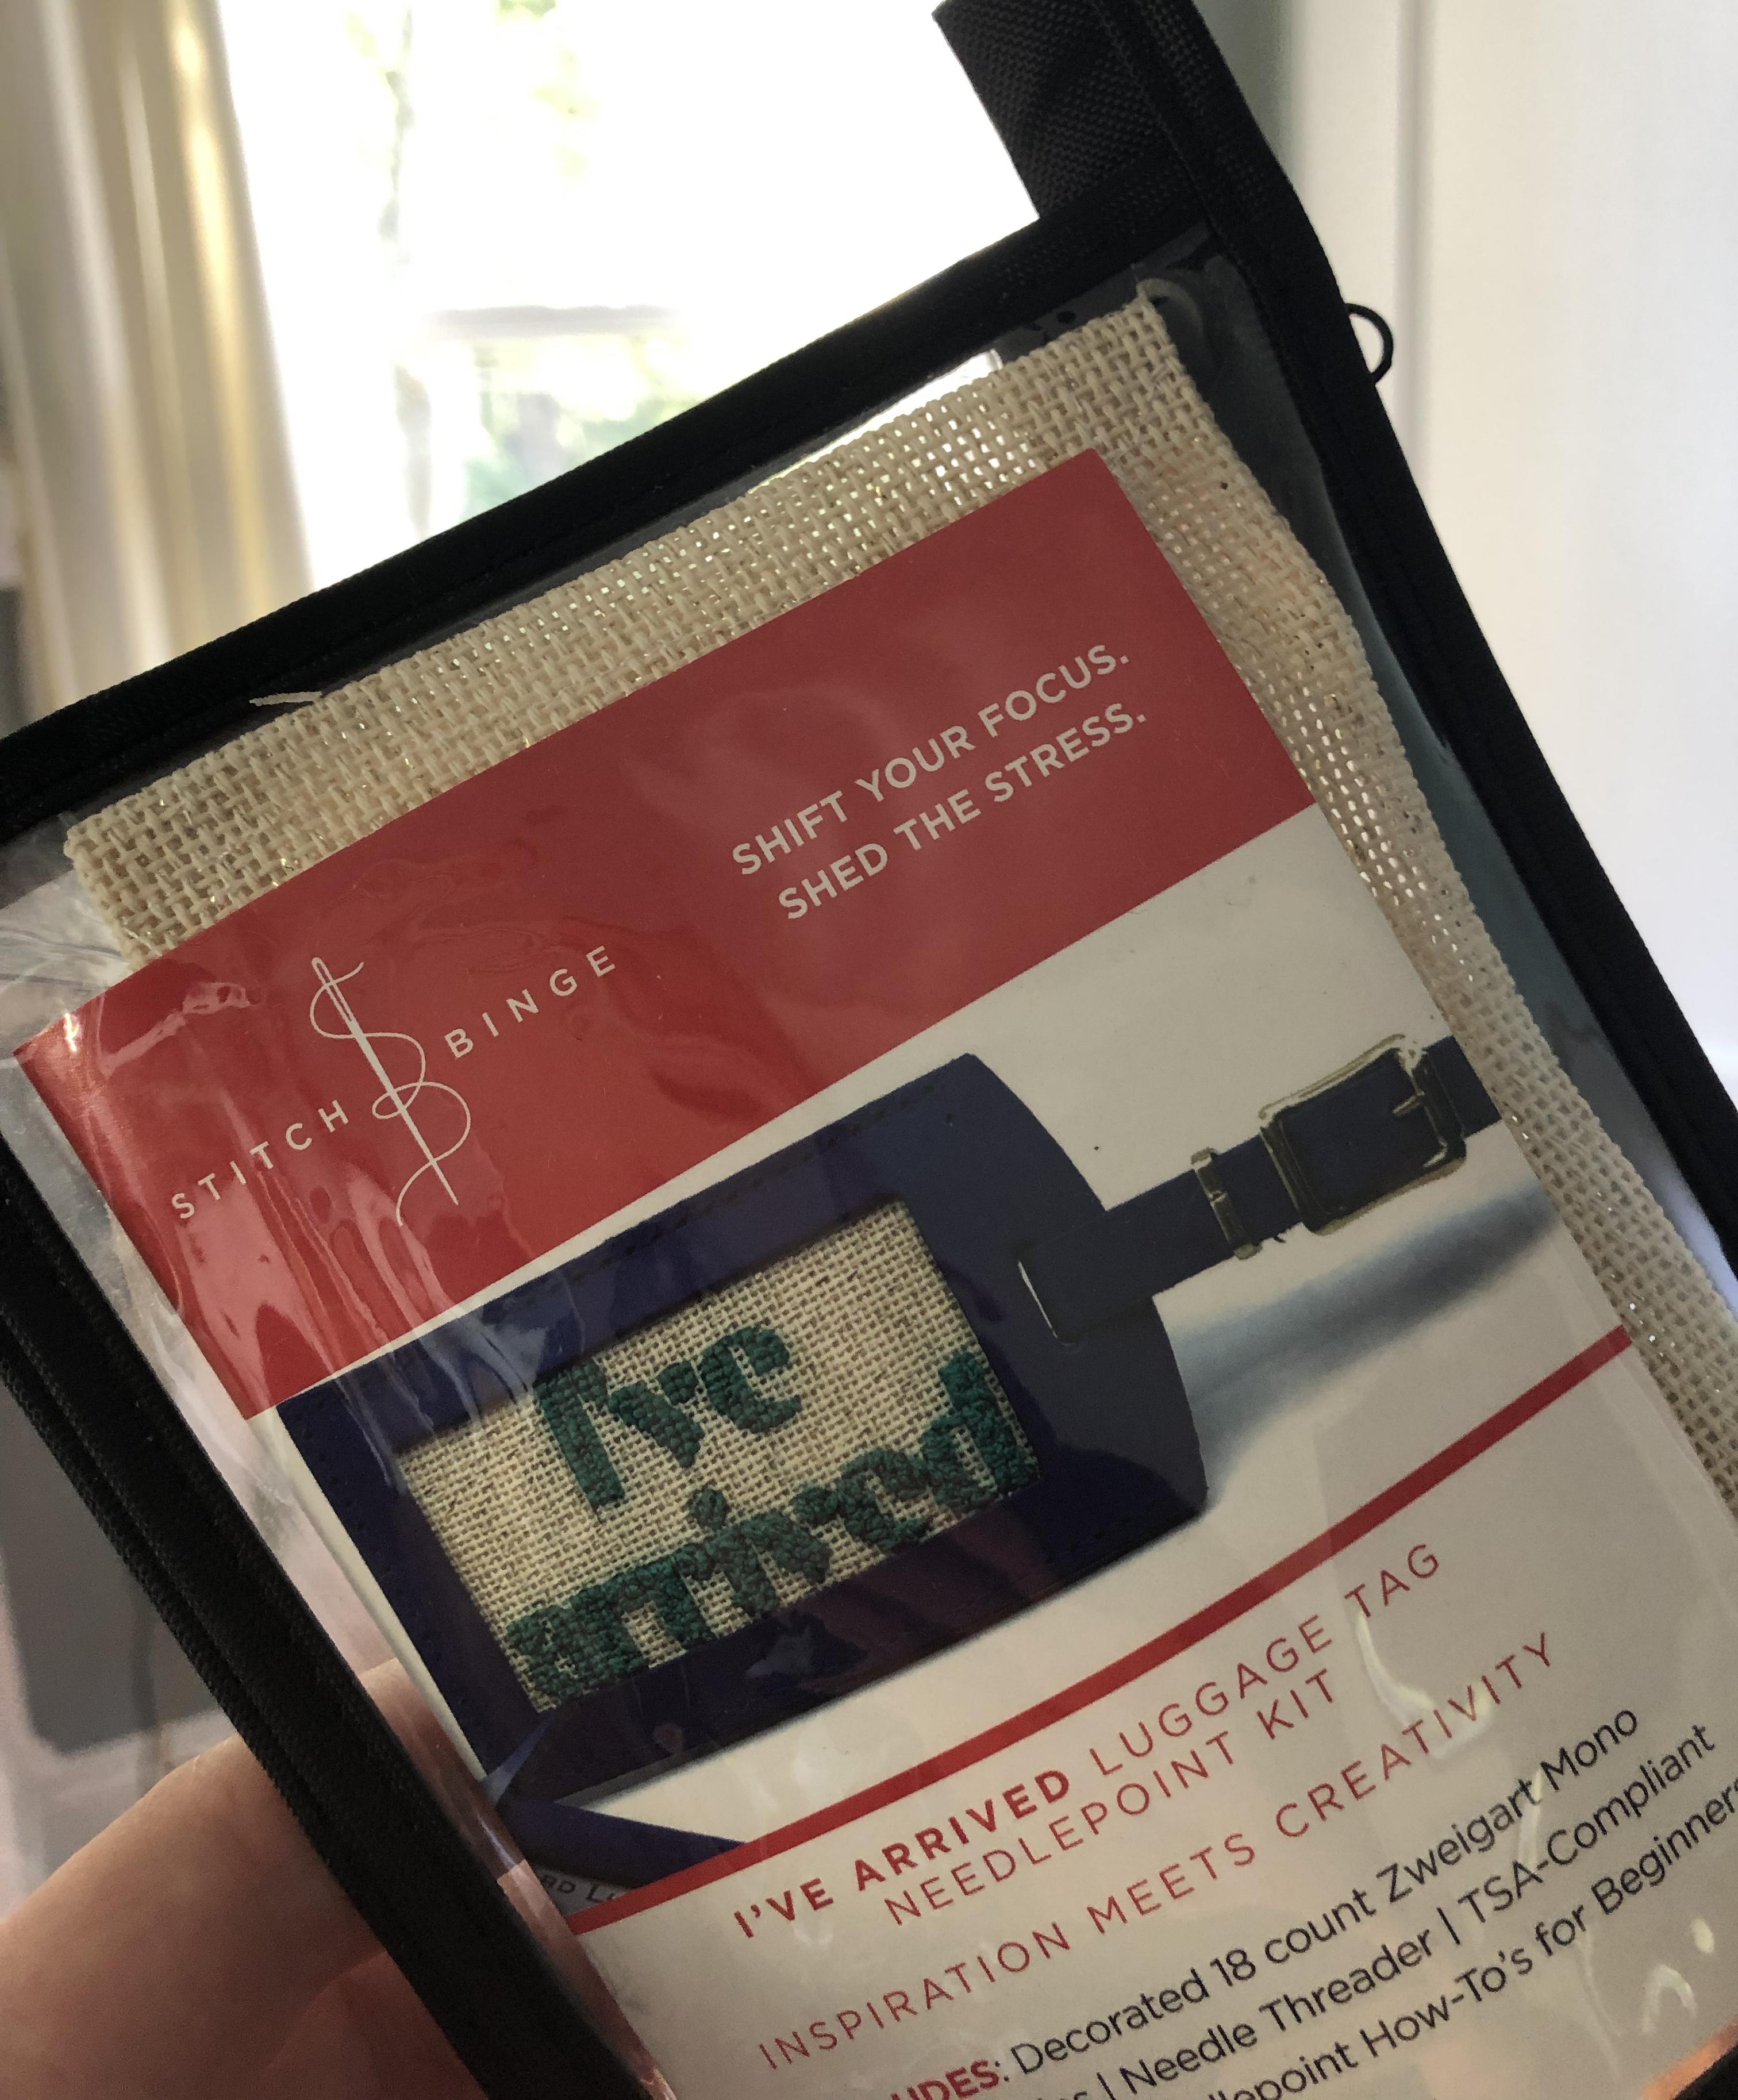 Stitch Bing I've Arrived Luggage Tag Kit